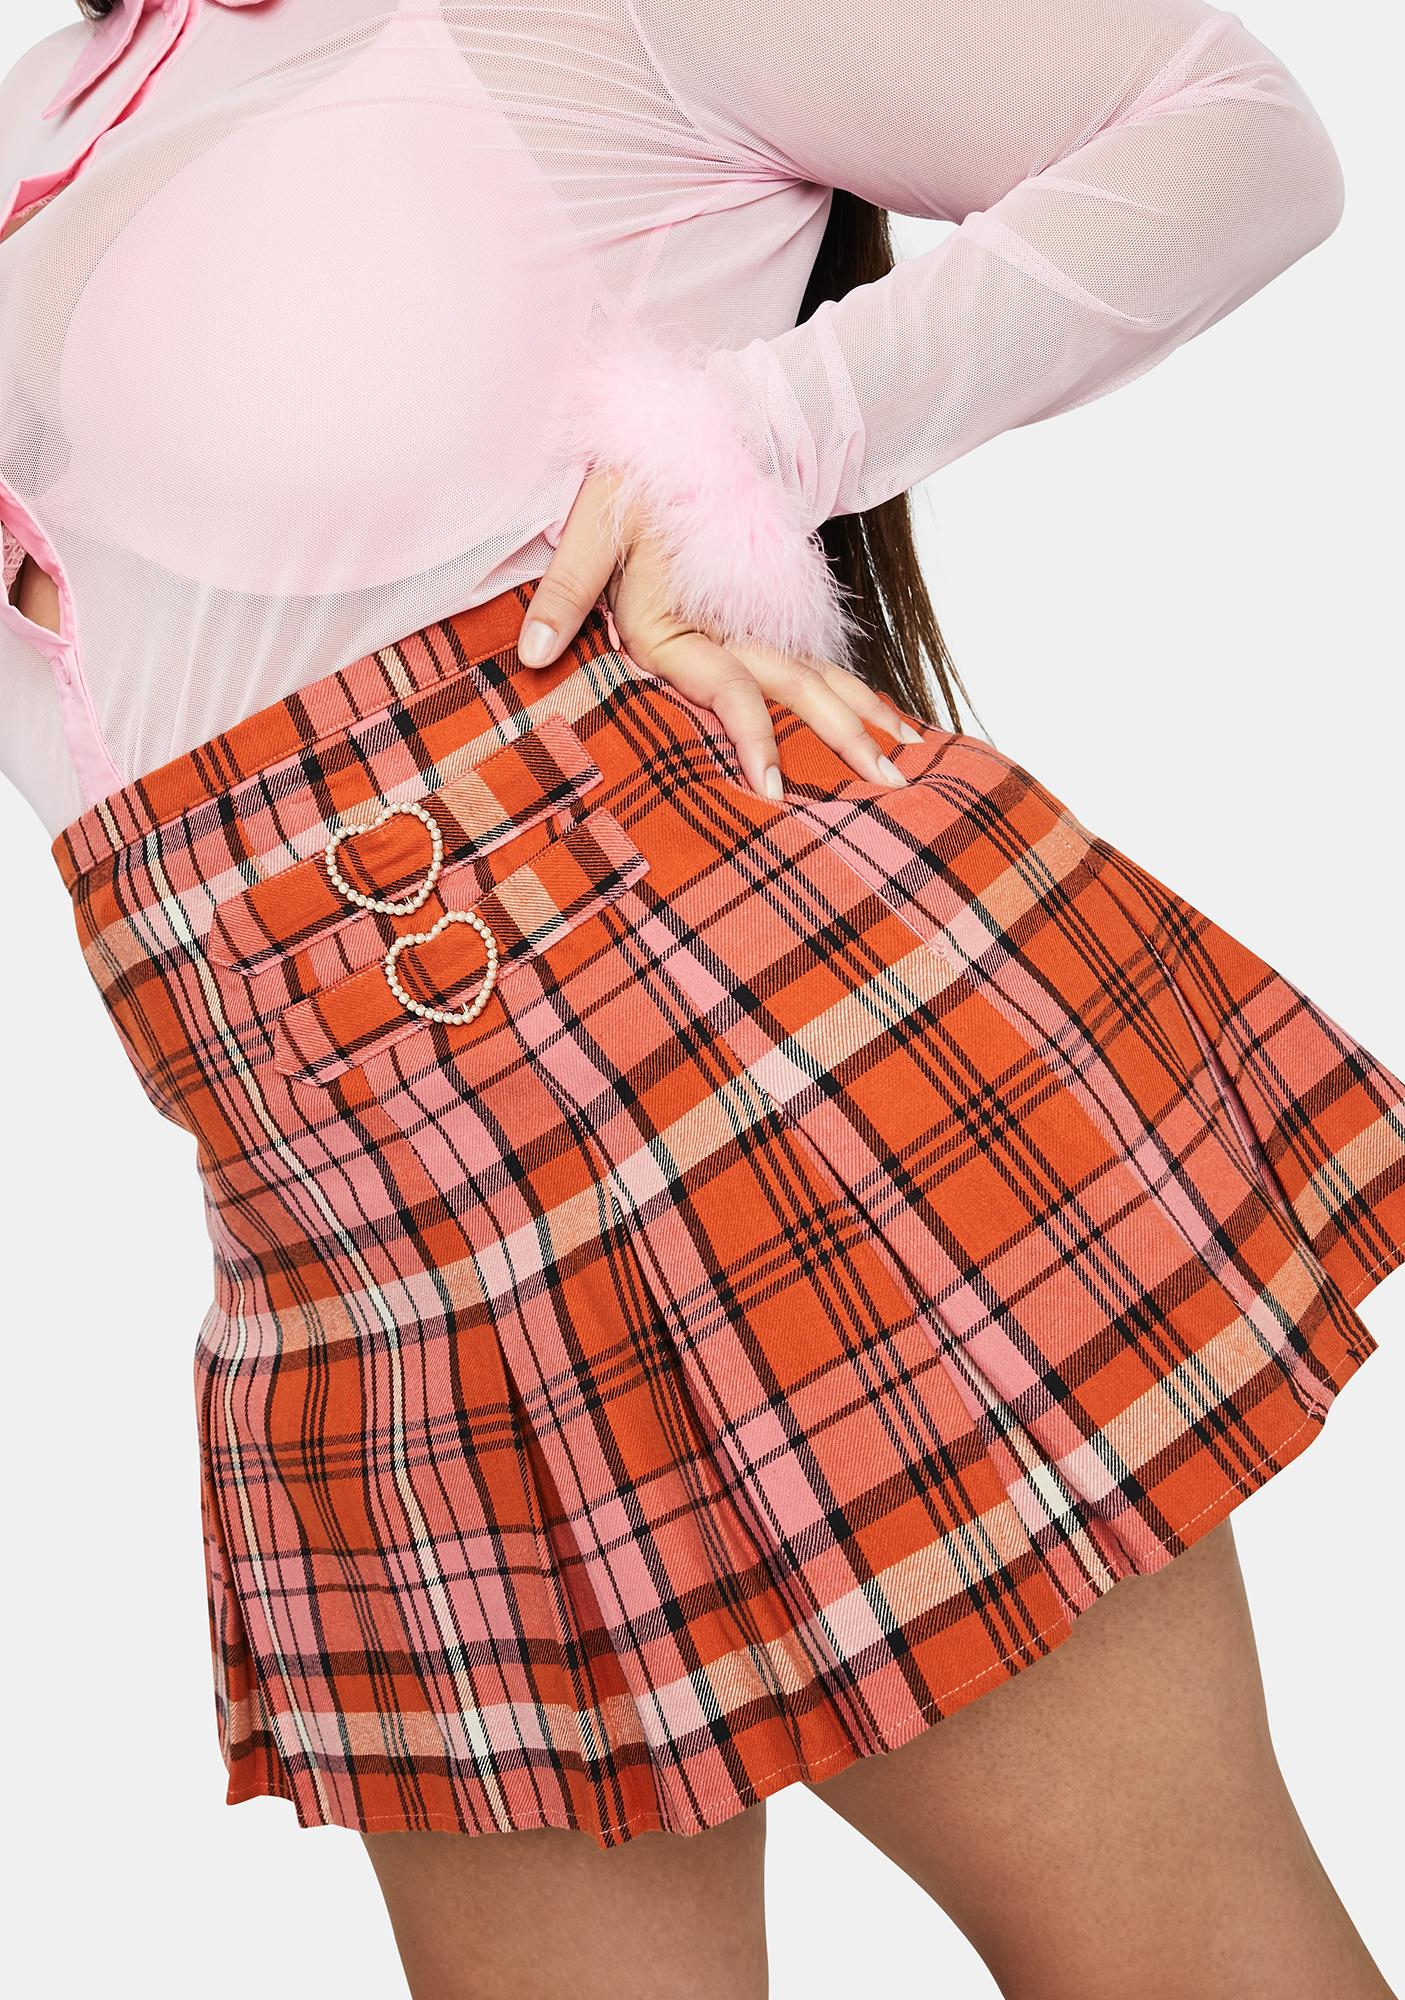 Sugar Thrillz Real Everlasting Love Plaid Skirt